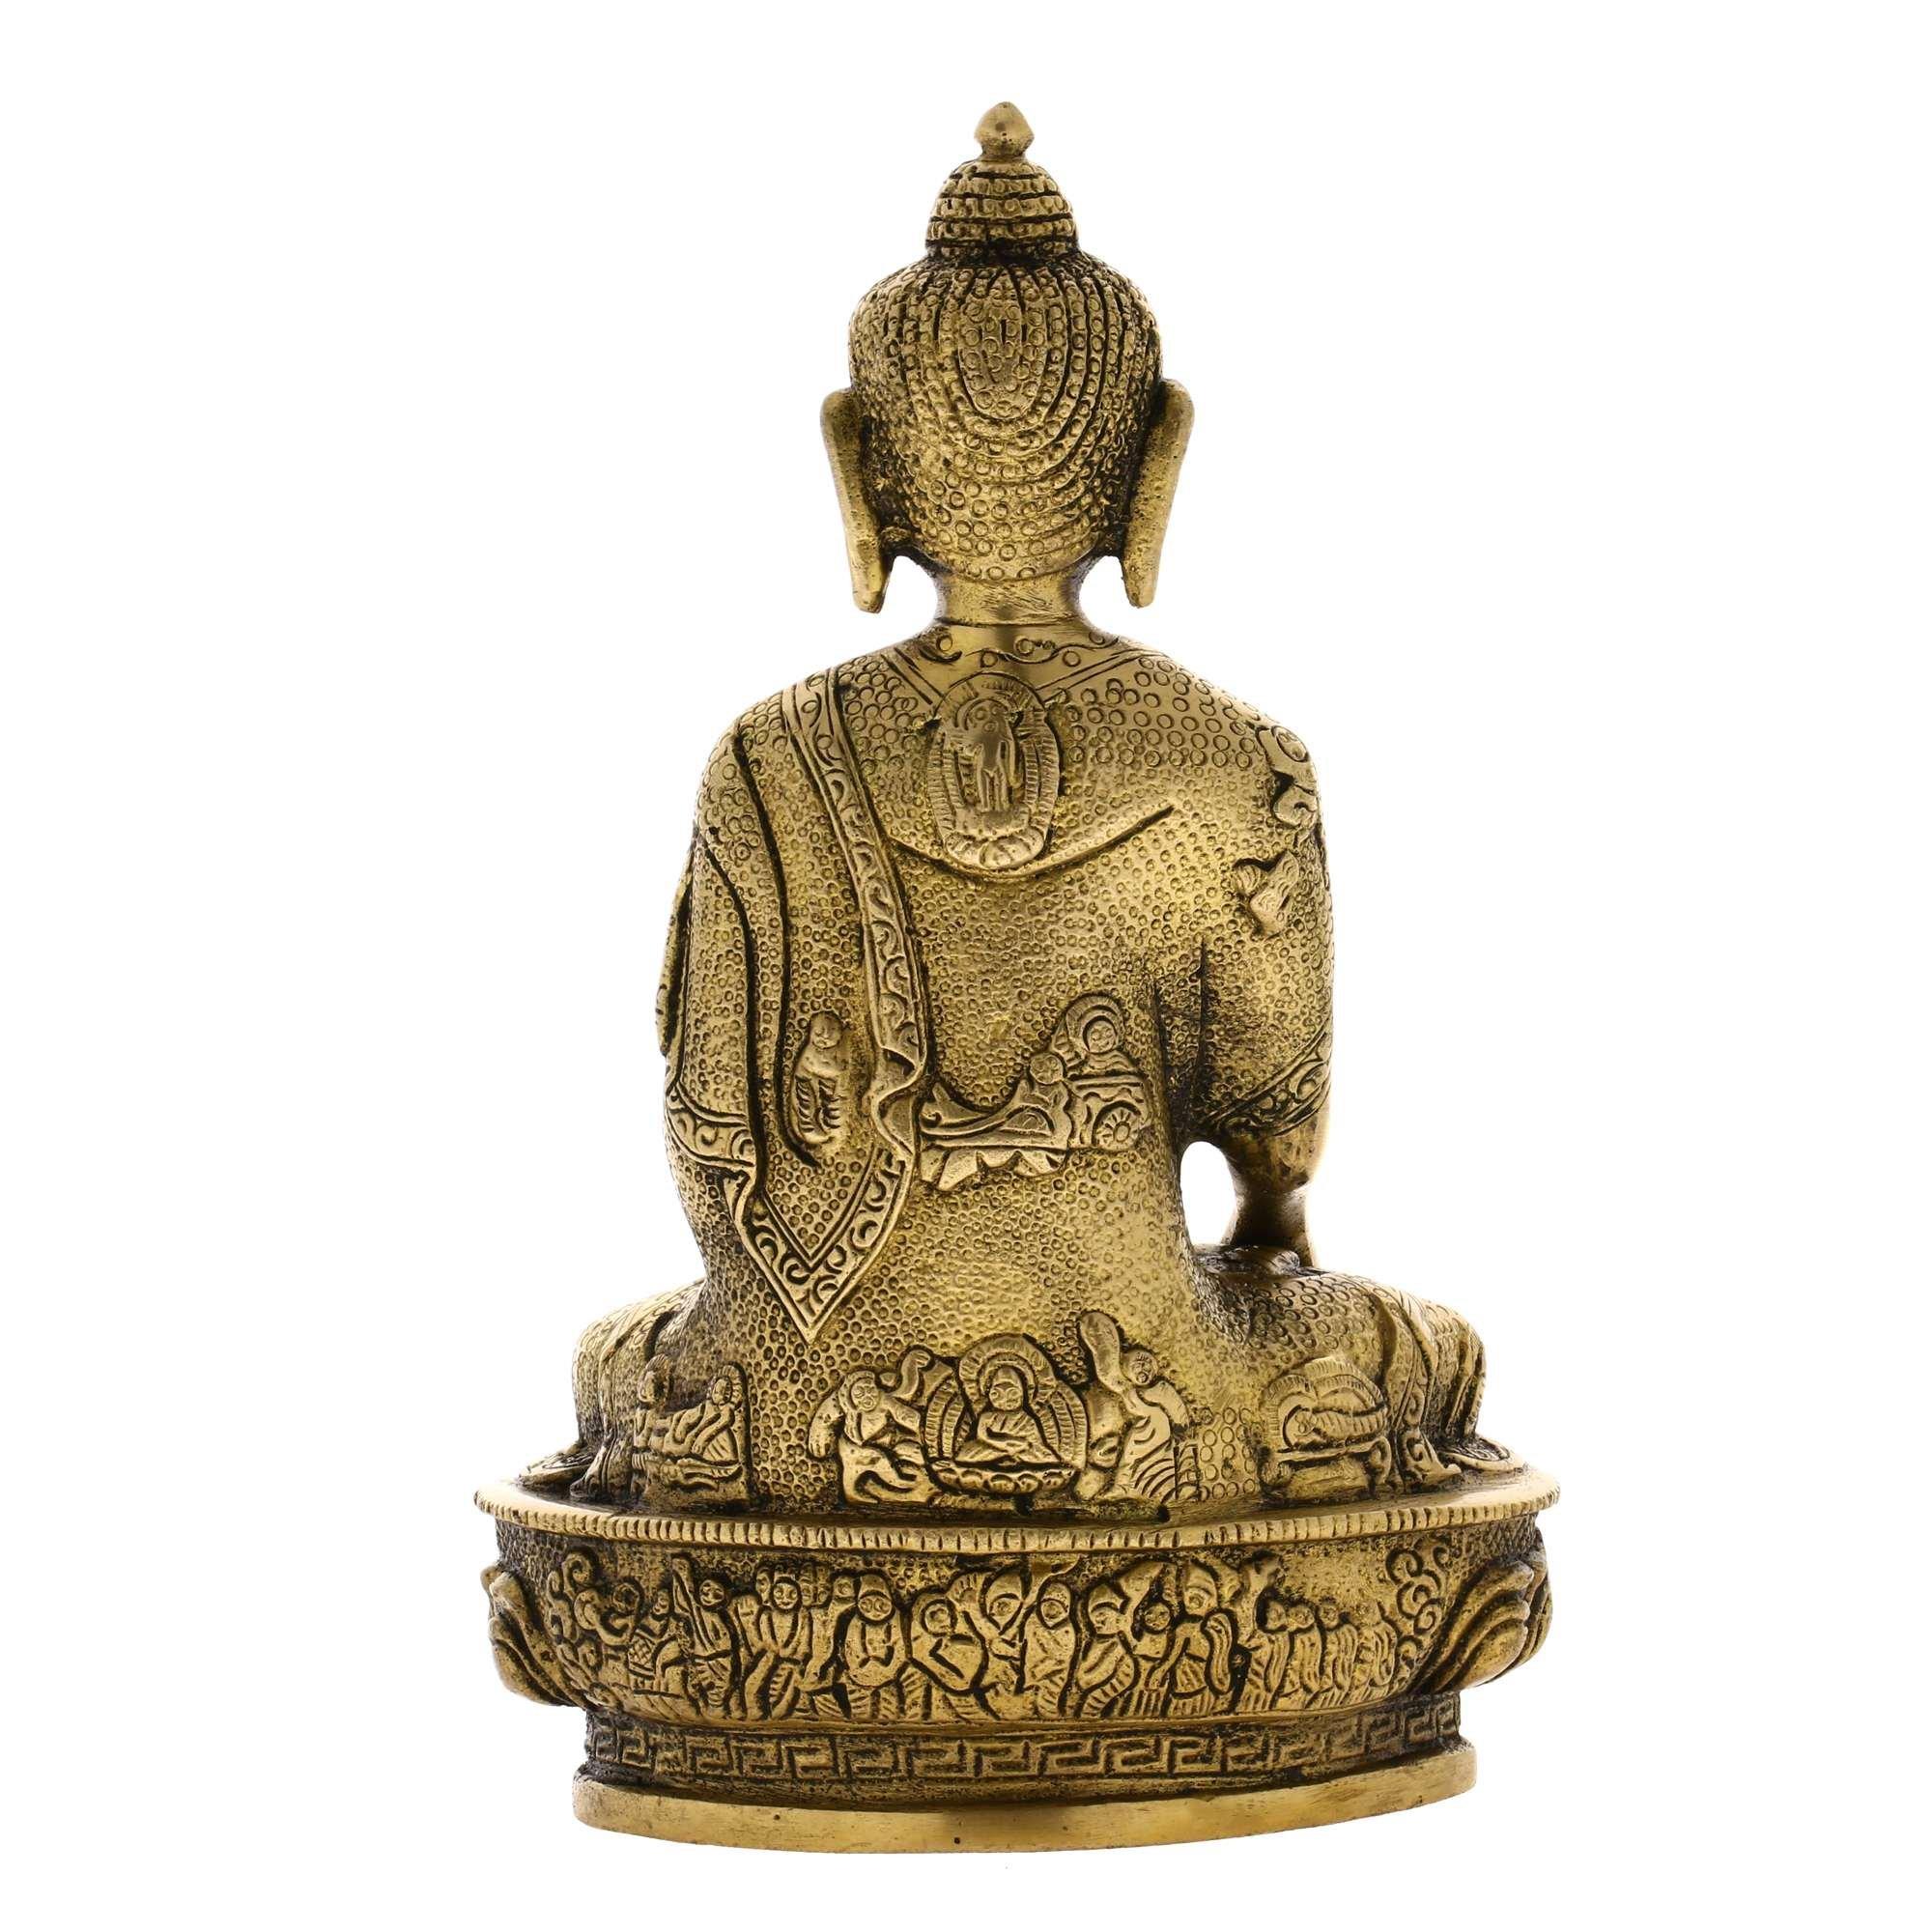 Handmade Seated Buddha Statue Sculpture India Metal Sculpture Spiritual Gifts by ShalinIndia (Image #2)